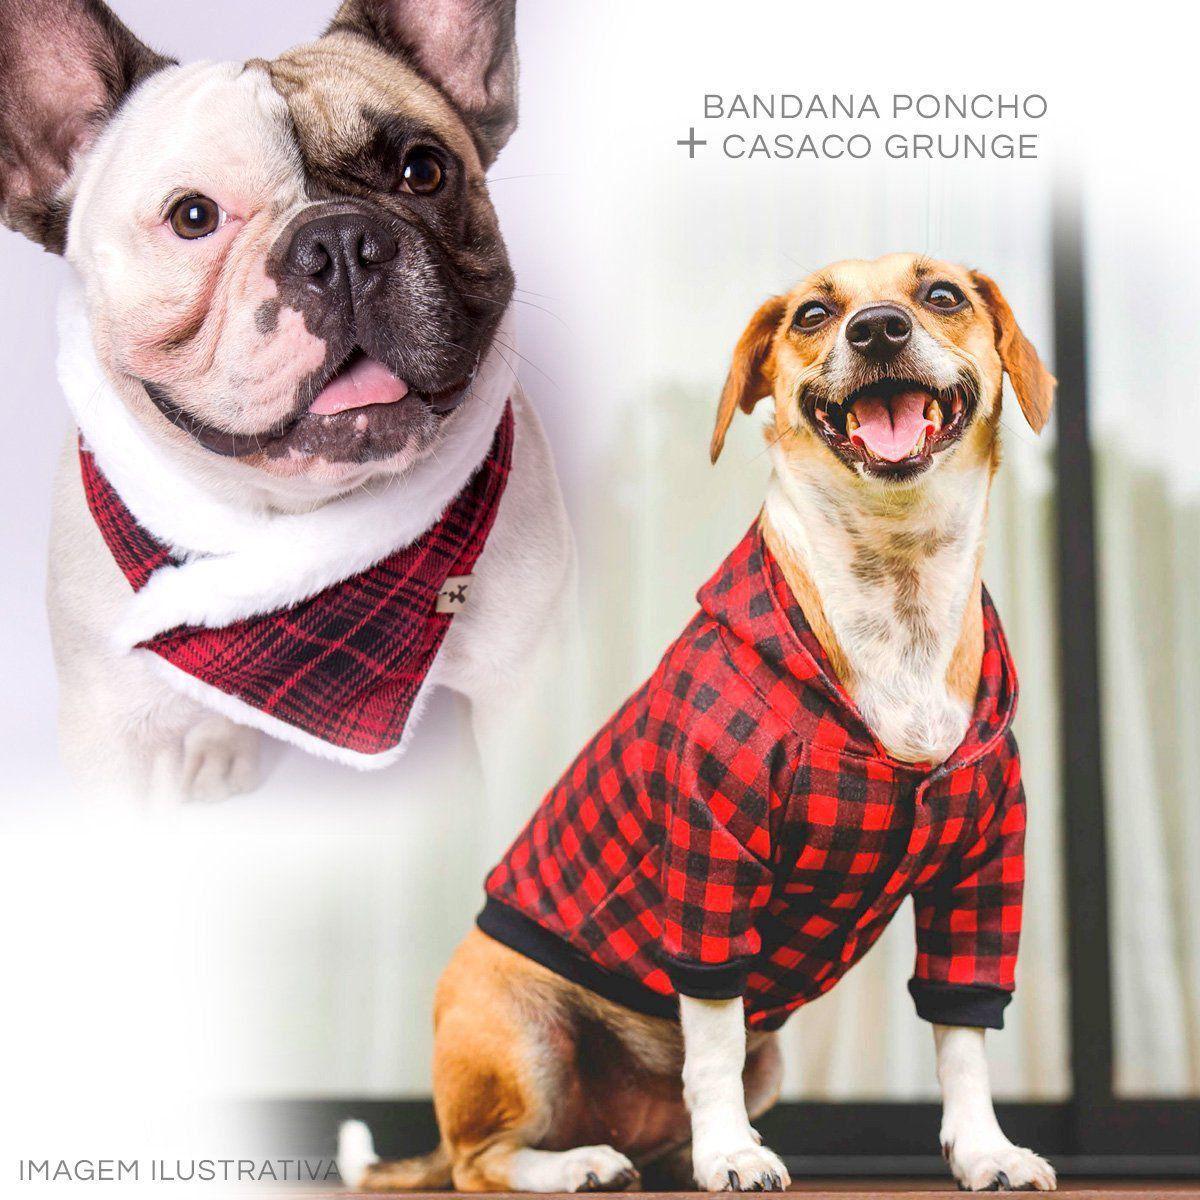 Kit Bandana Poncho Bo.be + Casaco Grunge Santo Amigo